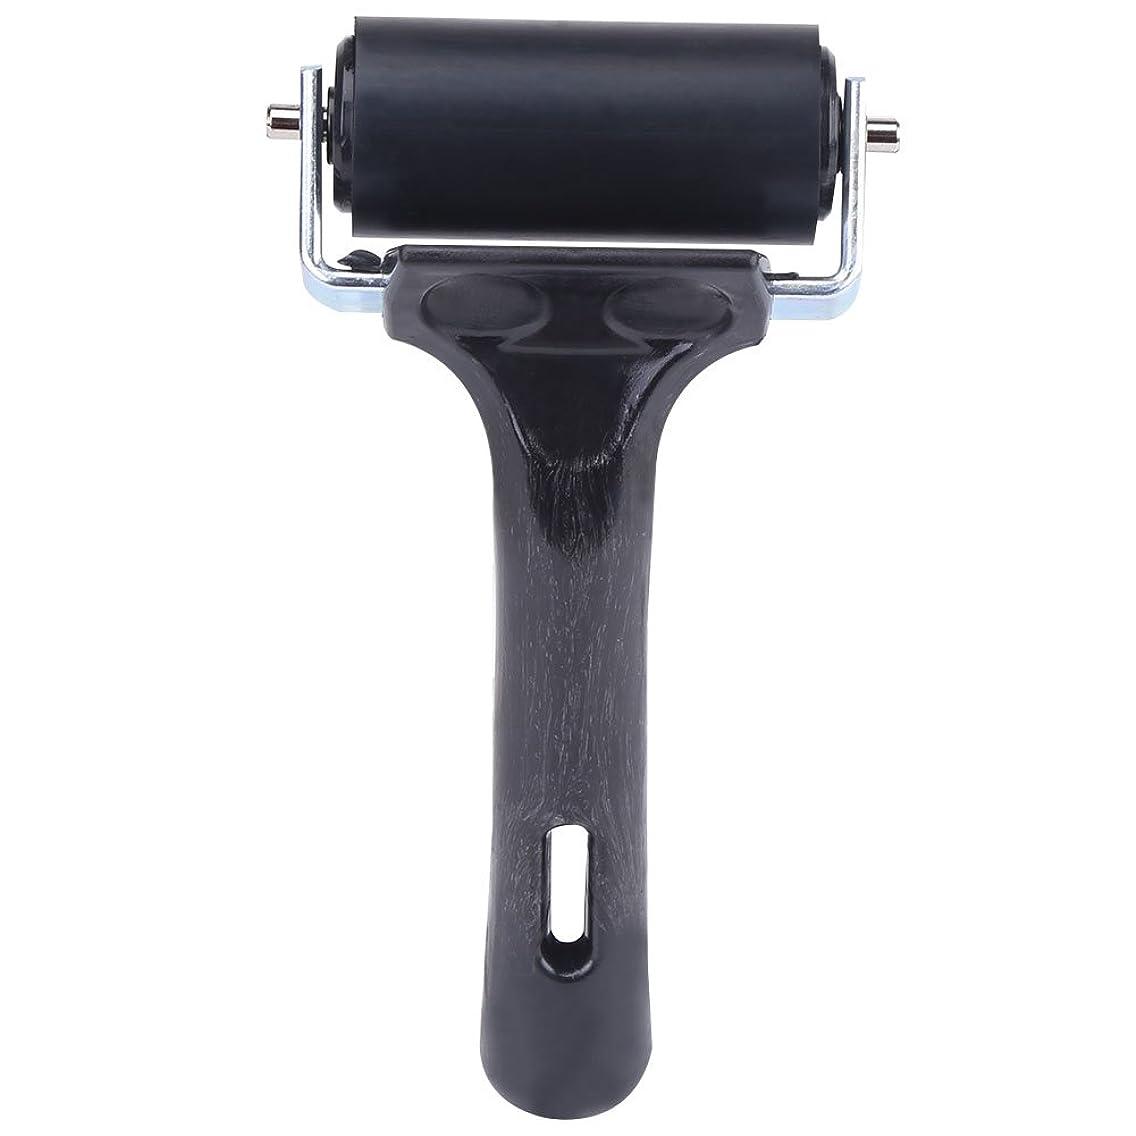 2.3 inch Soft Rubber Brayer,Rubber Brayer Roller Paint Brush Ink Applicator Art Craft Oil Painting Tool